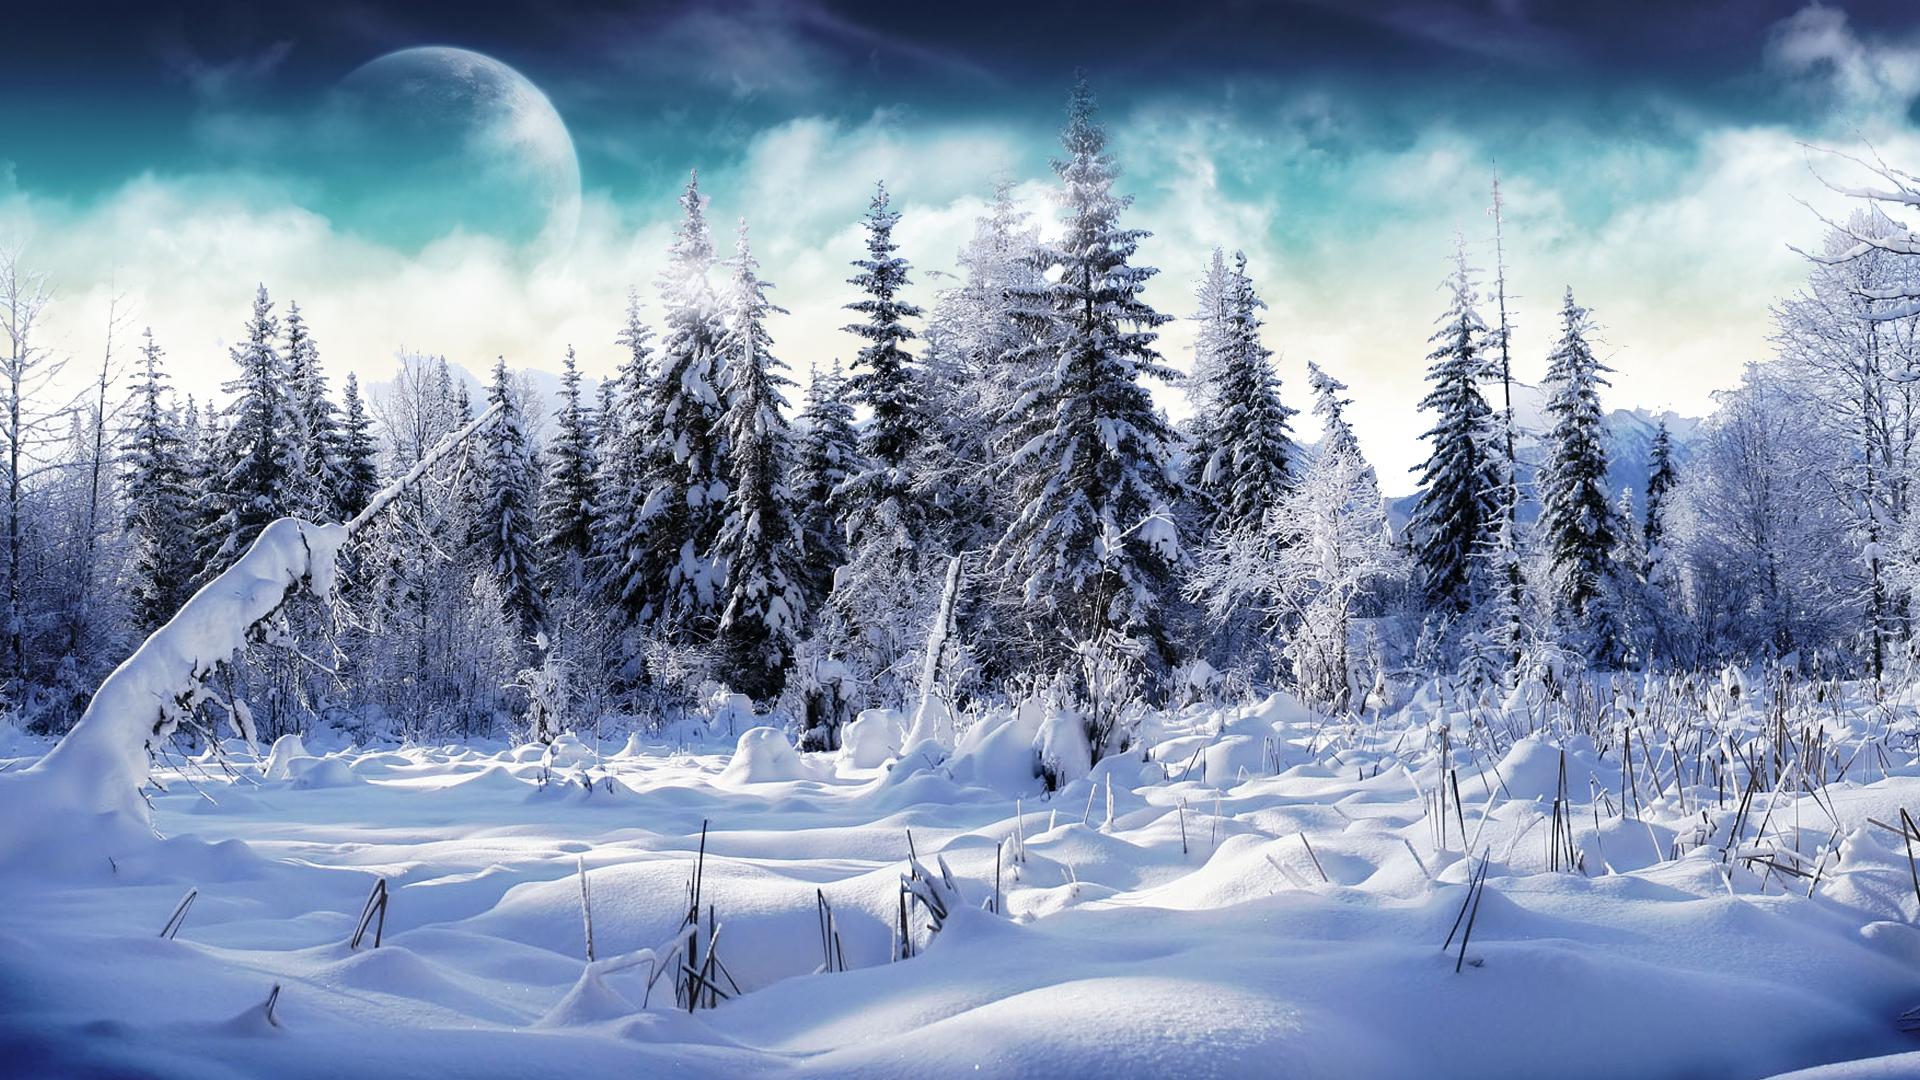 Download Wallpaper Mac Winter - SgXmRp  Pictures_26394.jpg